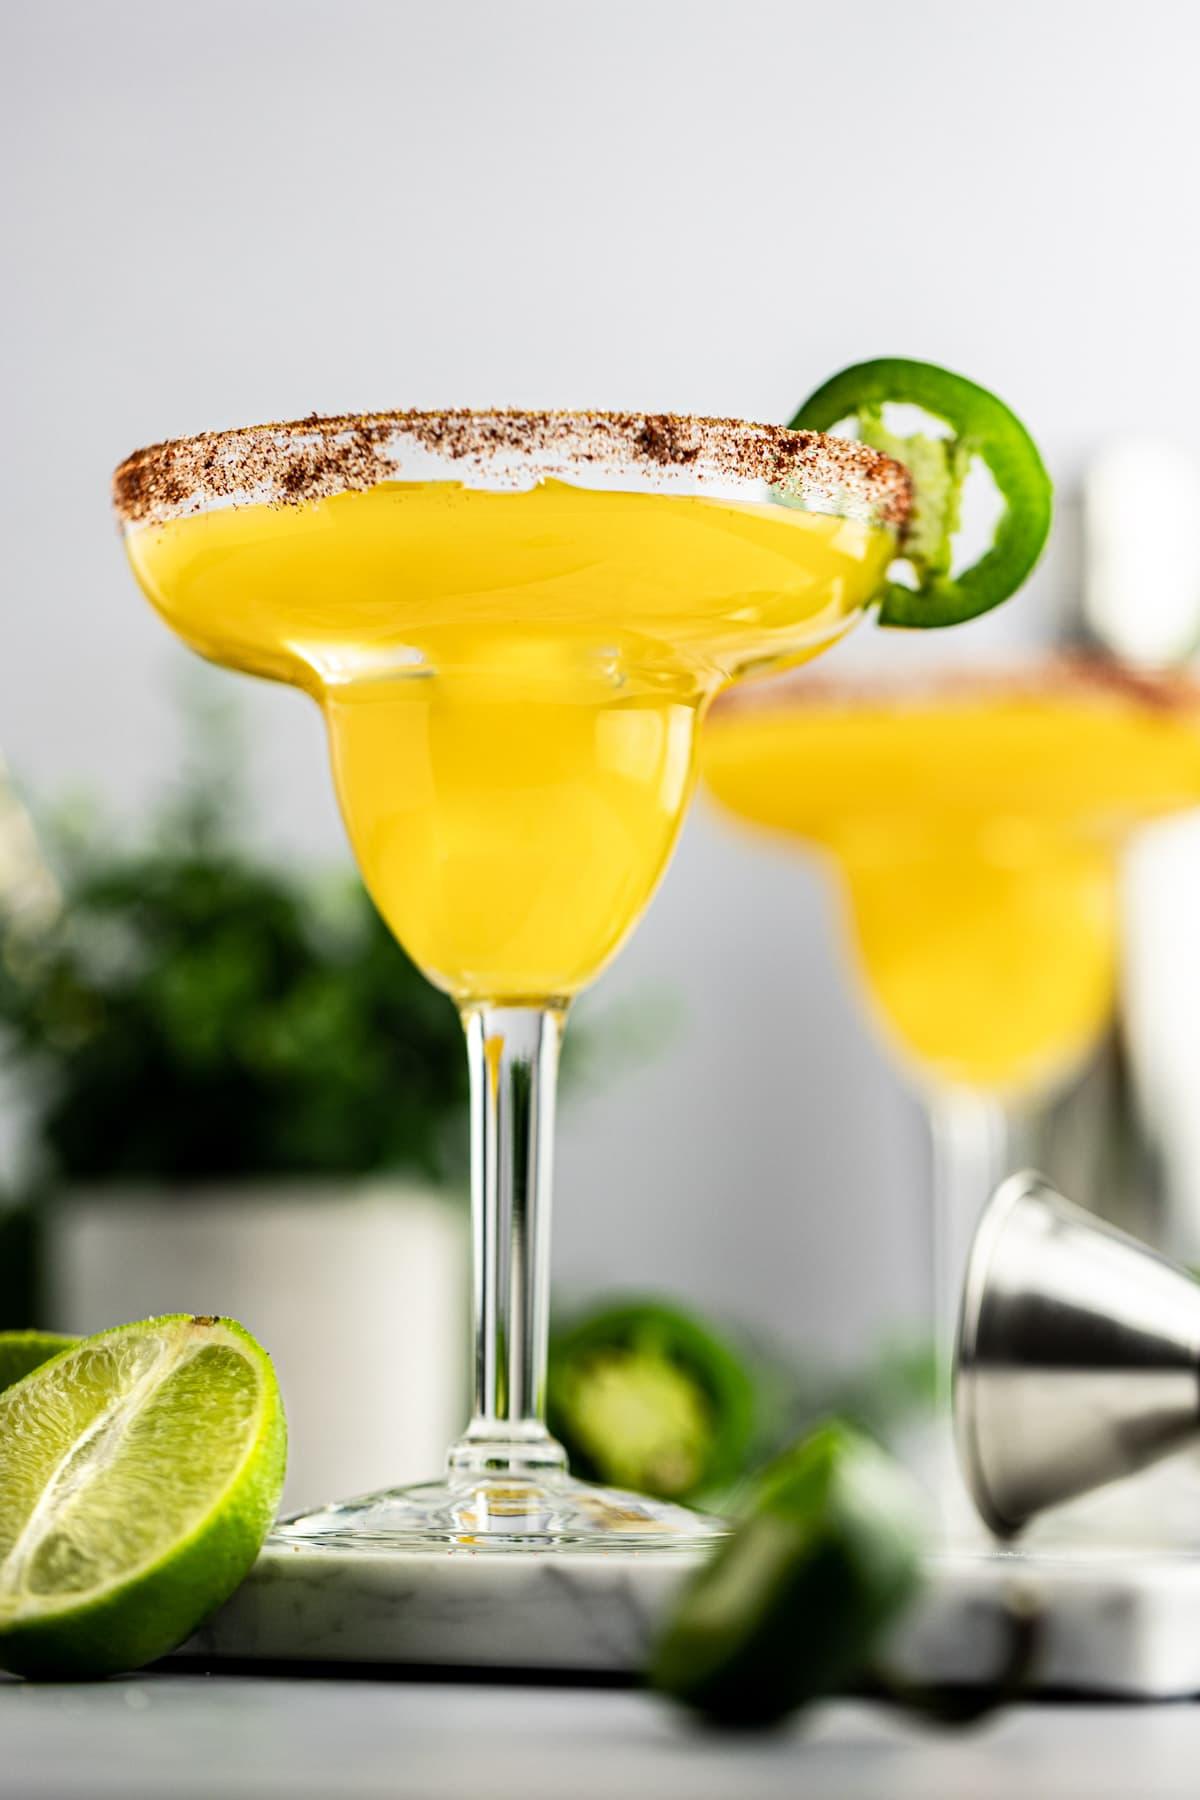 Up close photo of a mango jalapeño margarita, with tajin seasoning on the rim and garnished with a jalapeño.